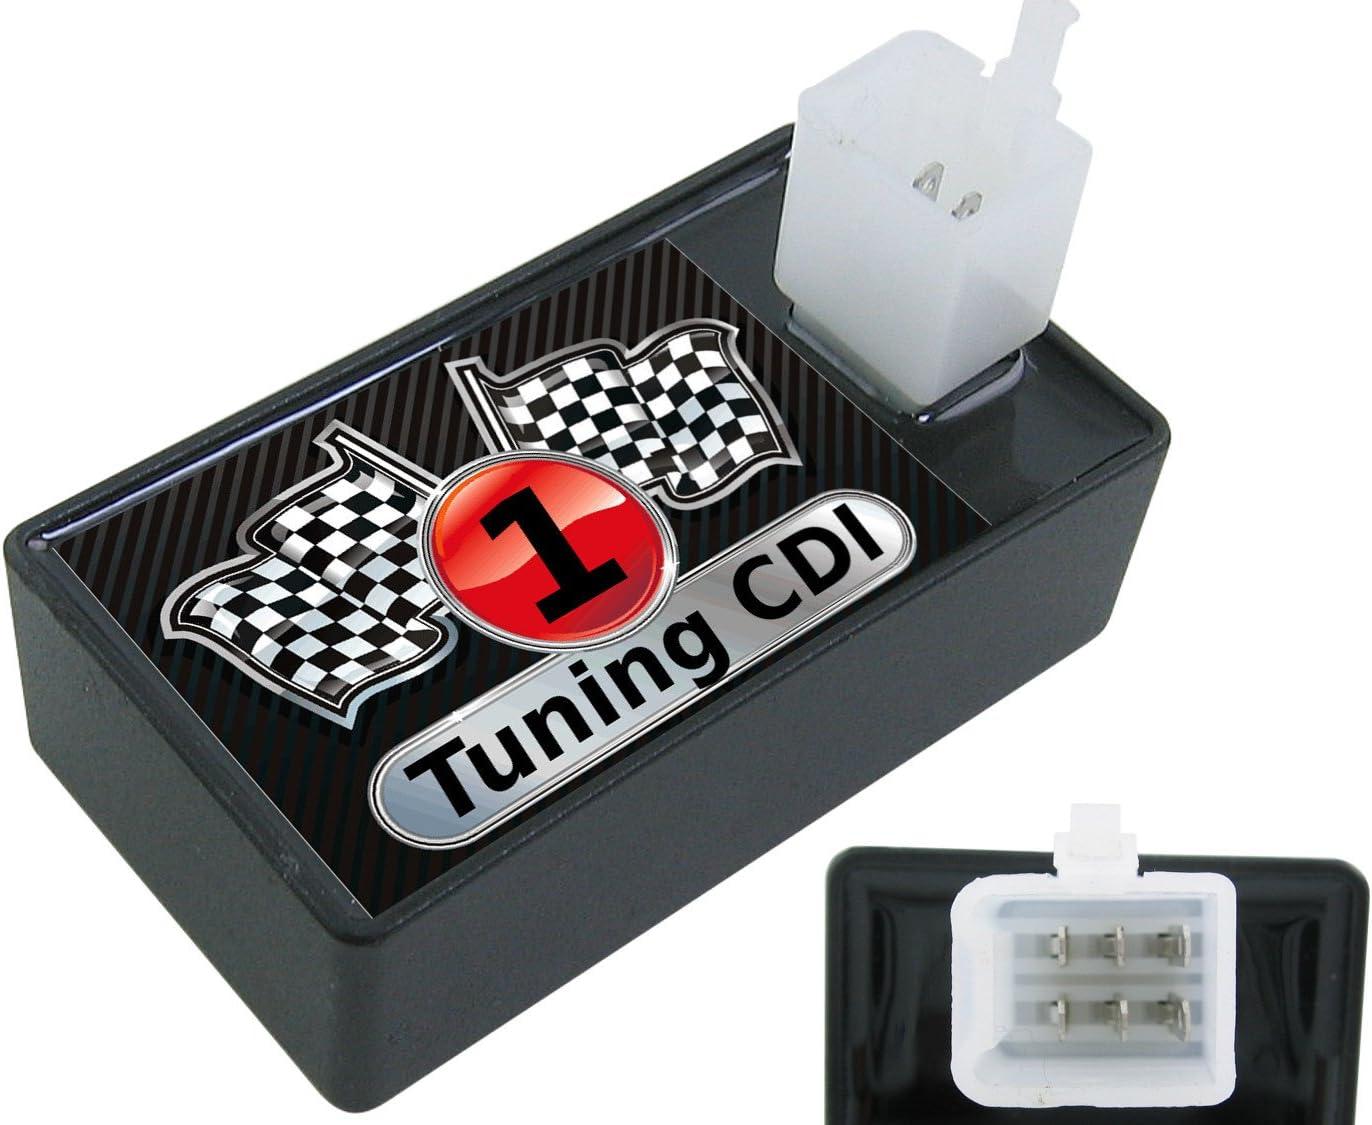 New Retro 50ccm 4T // CDI Benero Retro 50ccm 4T CDI Jack Fox Retro Star Offene Sport Tuning 6 Pin! 6 Pin! Speed Fox S